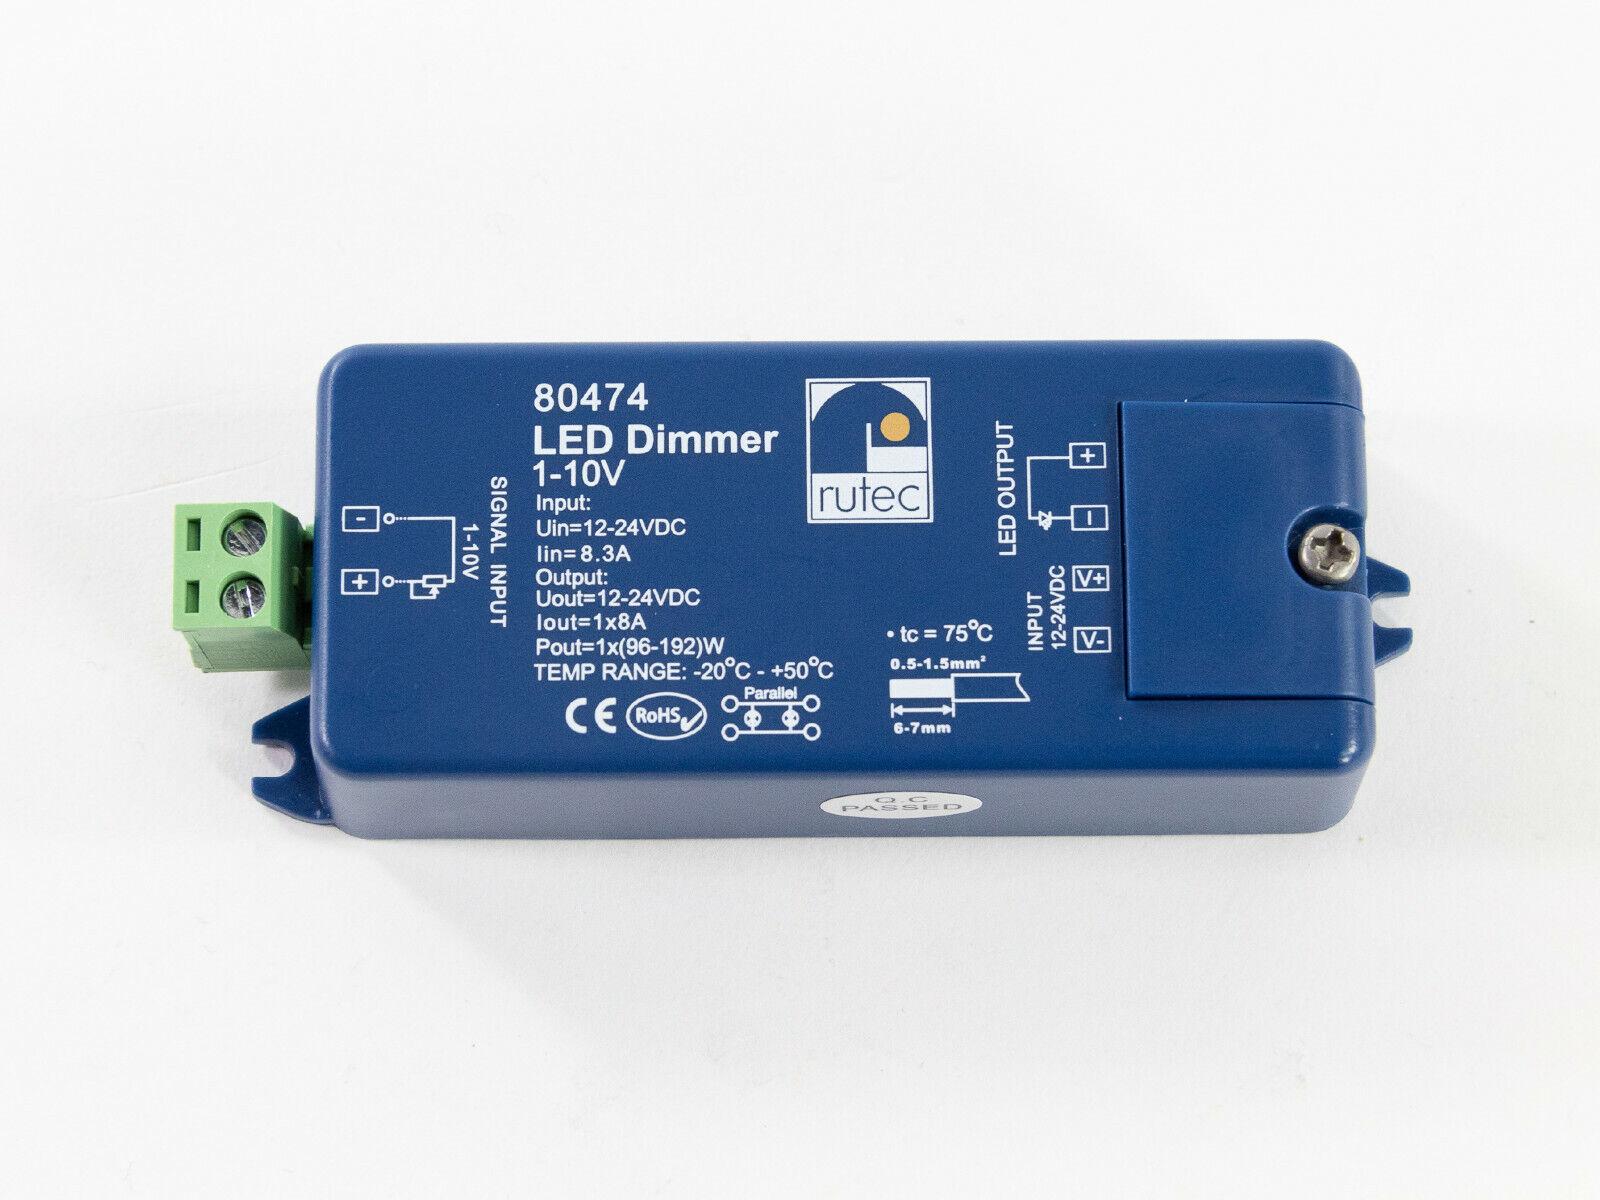 LED Dimmer rutec 1-10V 96W   12V DC -192W   24V DC   80474